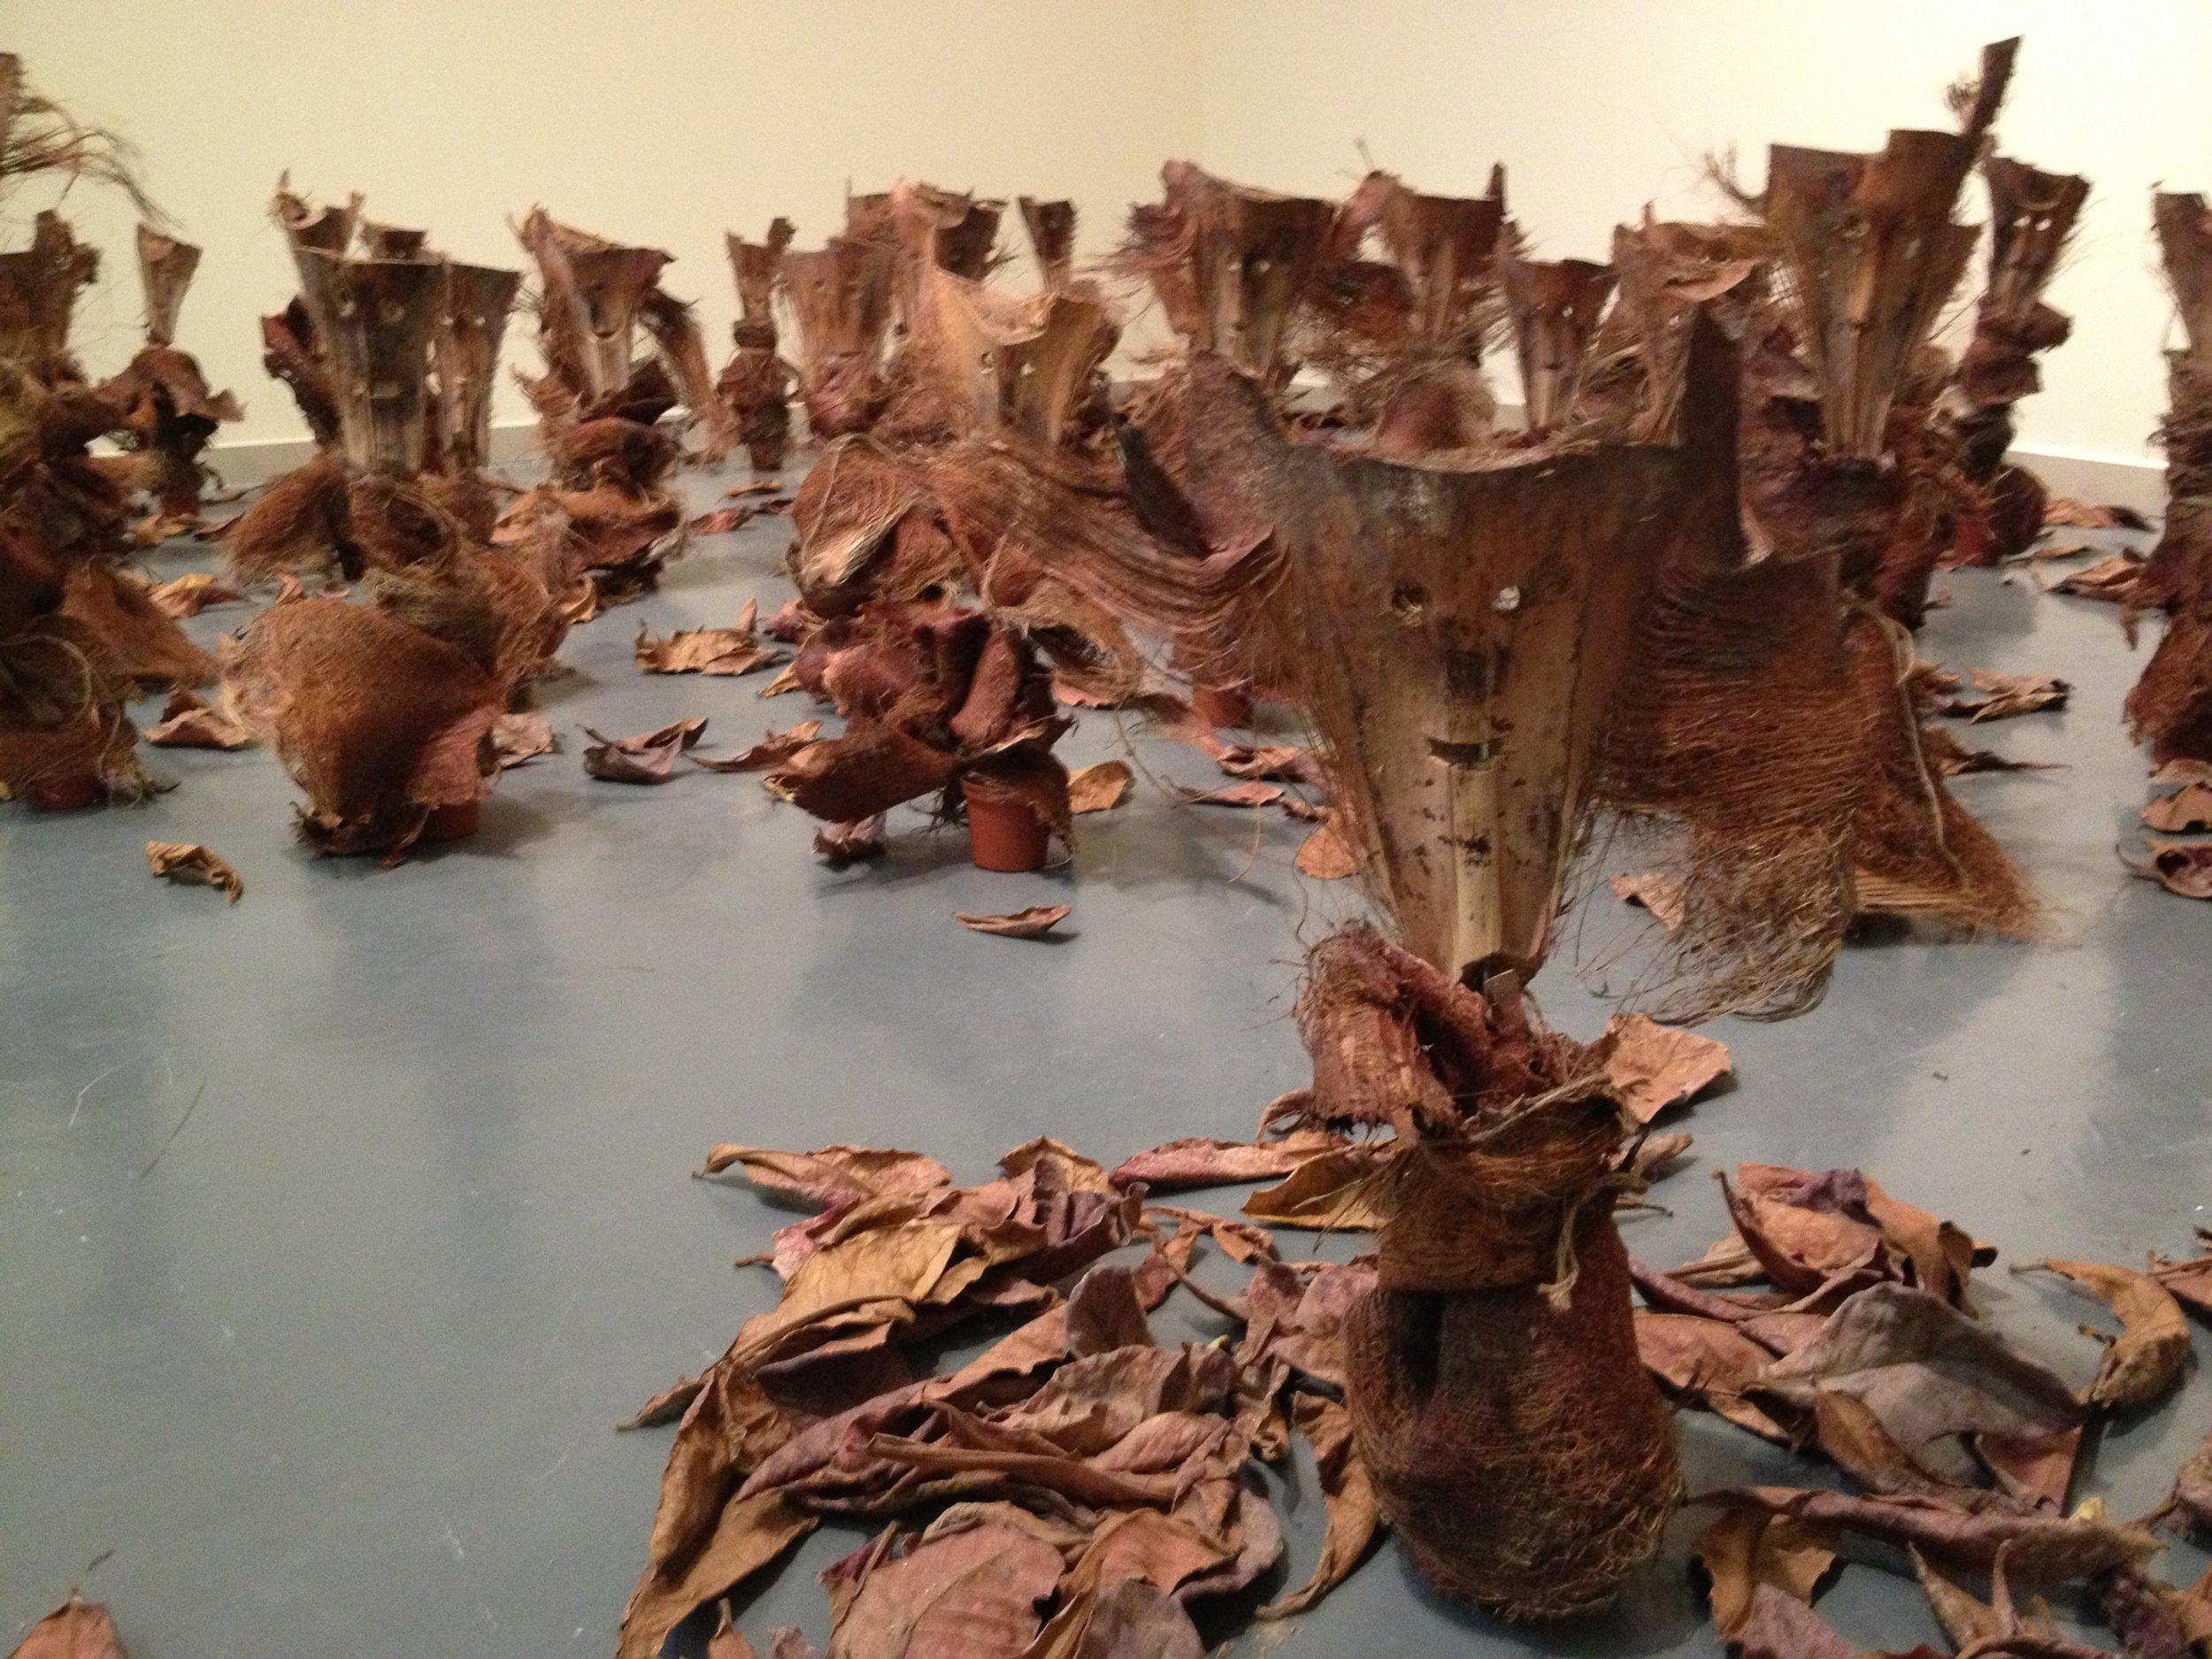 Wooden Dolls by Huda Saeed Saif